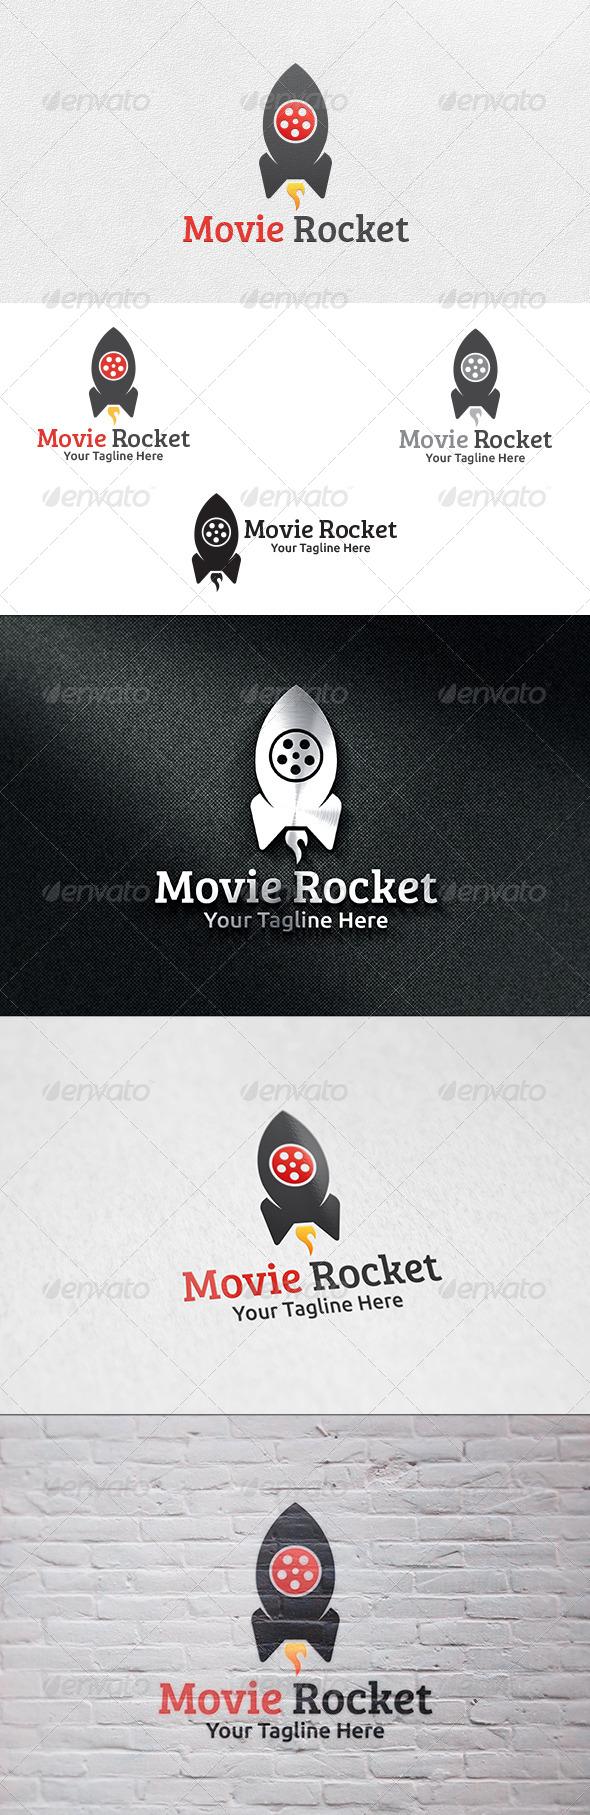 Movie Rocket - Logo Template